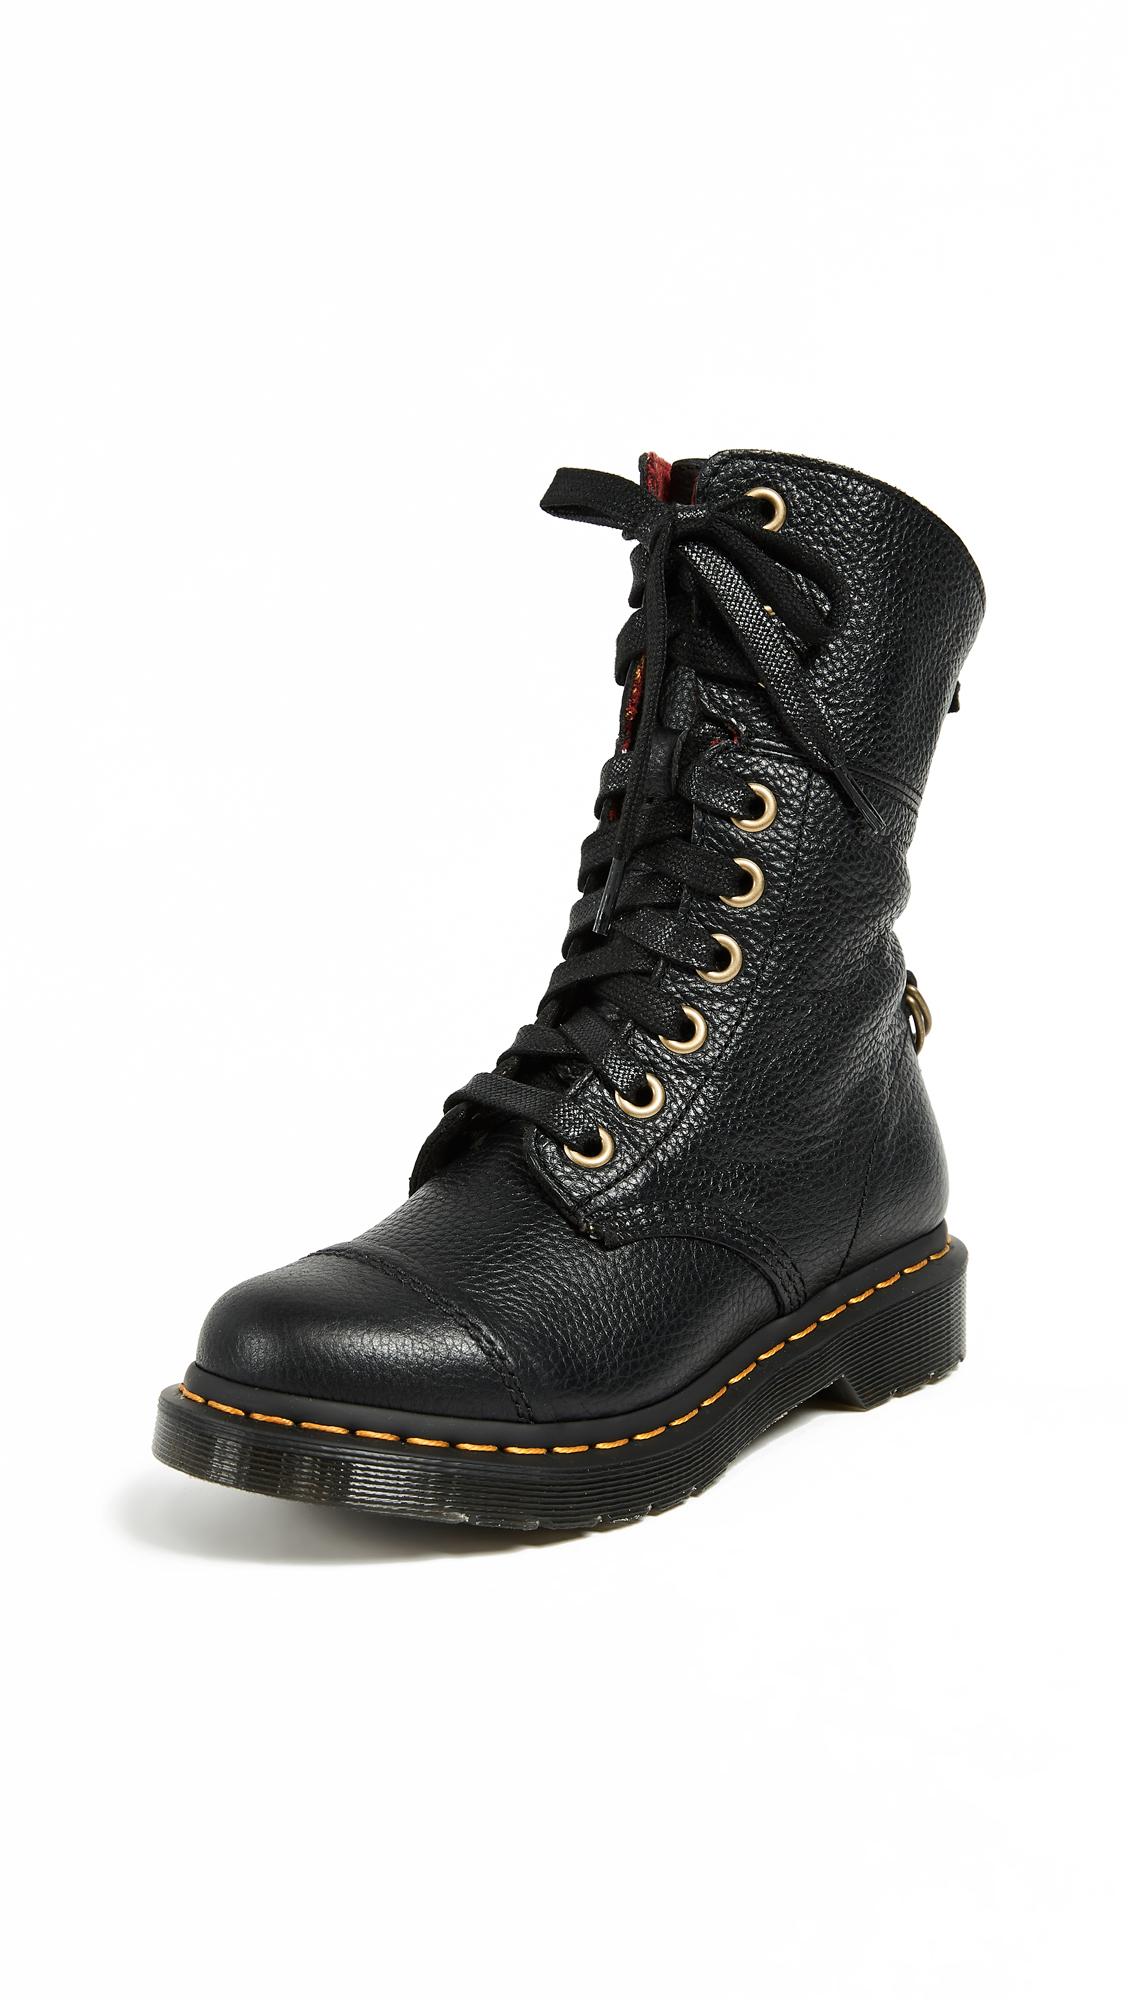 Dr. Martens Aimilita Boots - Black/Tartan Cherry Red